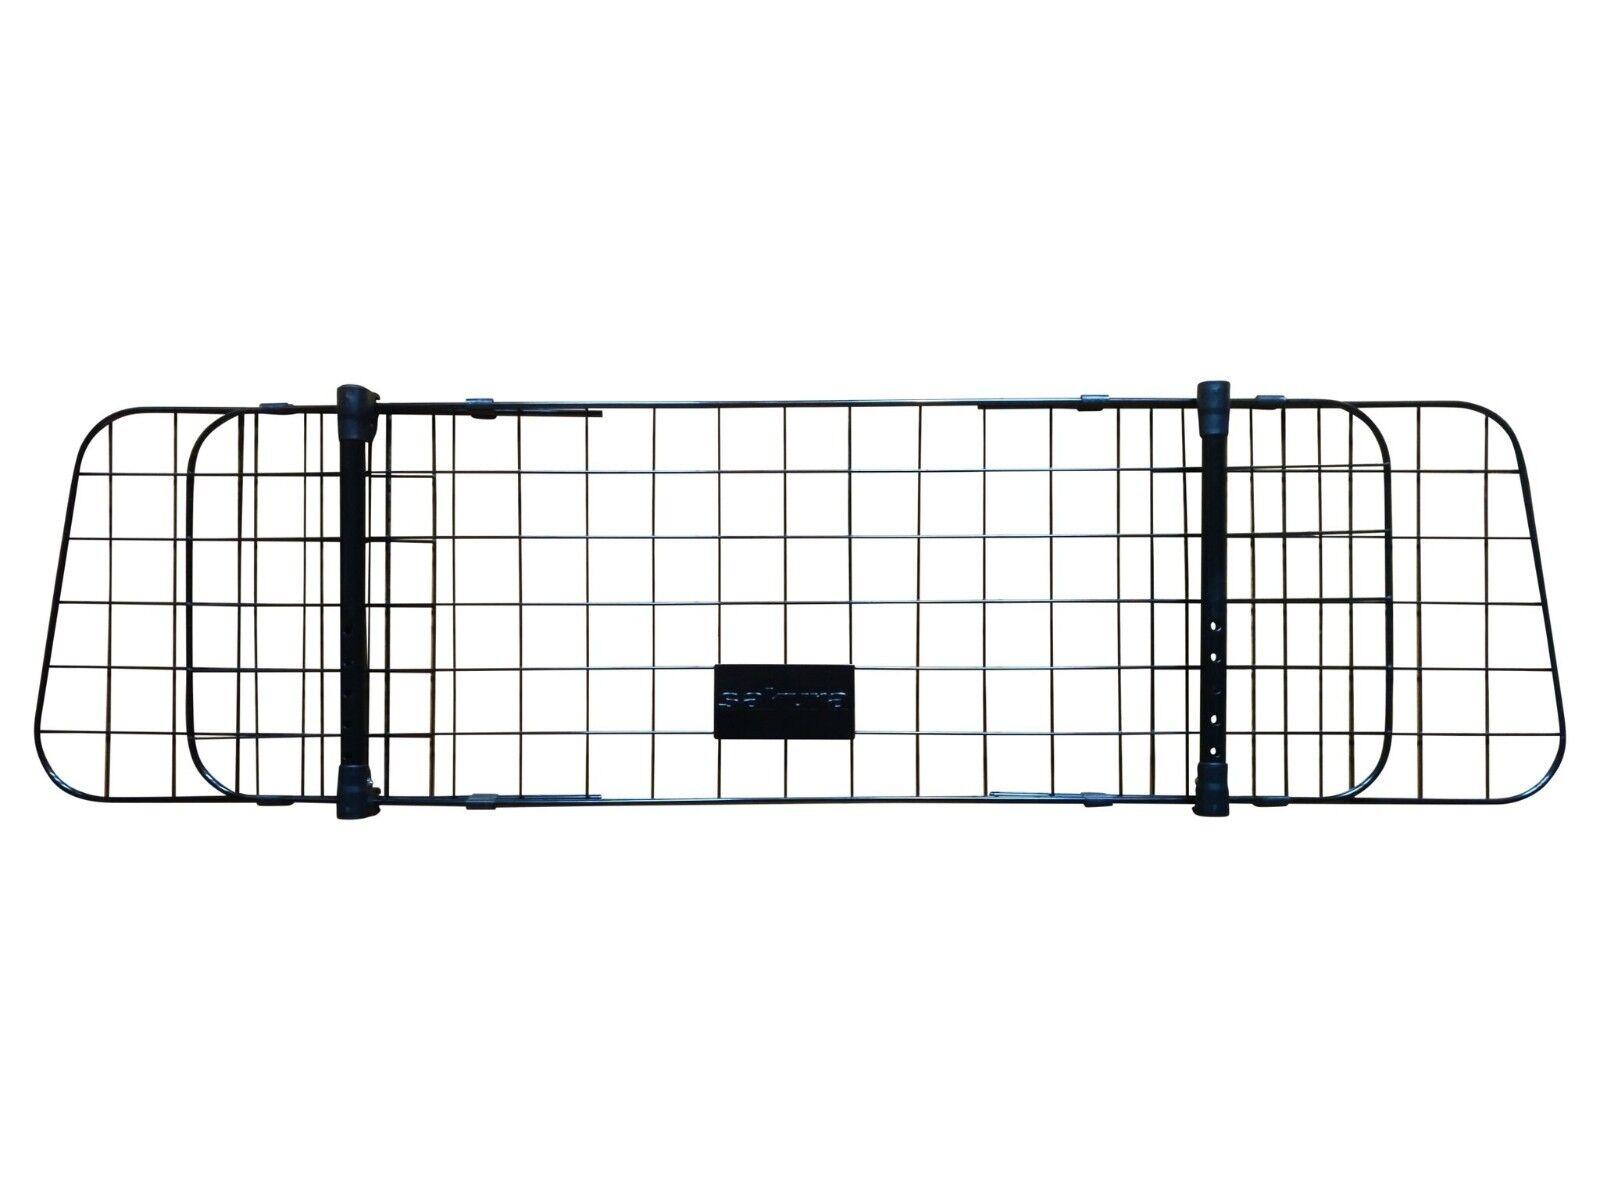 auto hundegitter test vergleich auto hundegitter. Black Bedroom Furniture Sets. Home Design Ideas